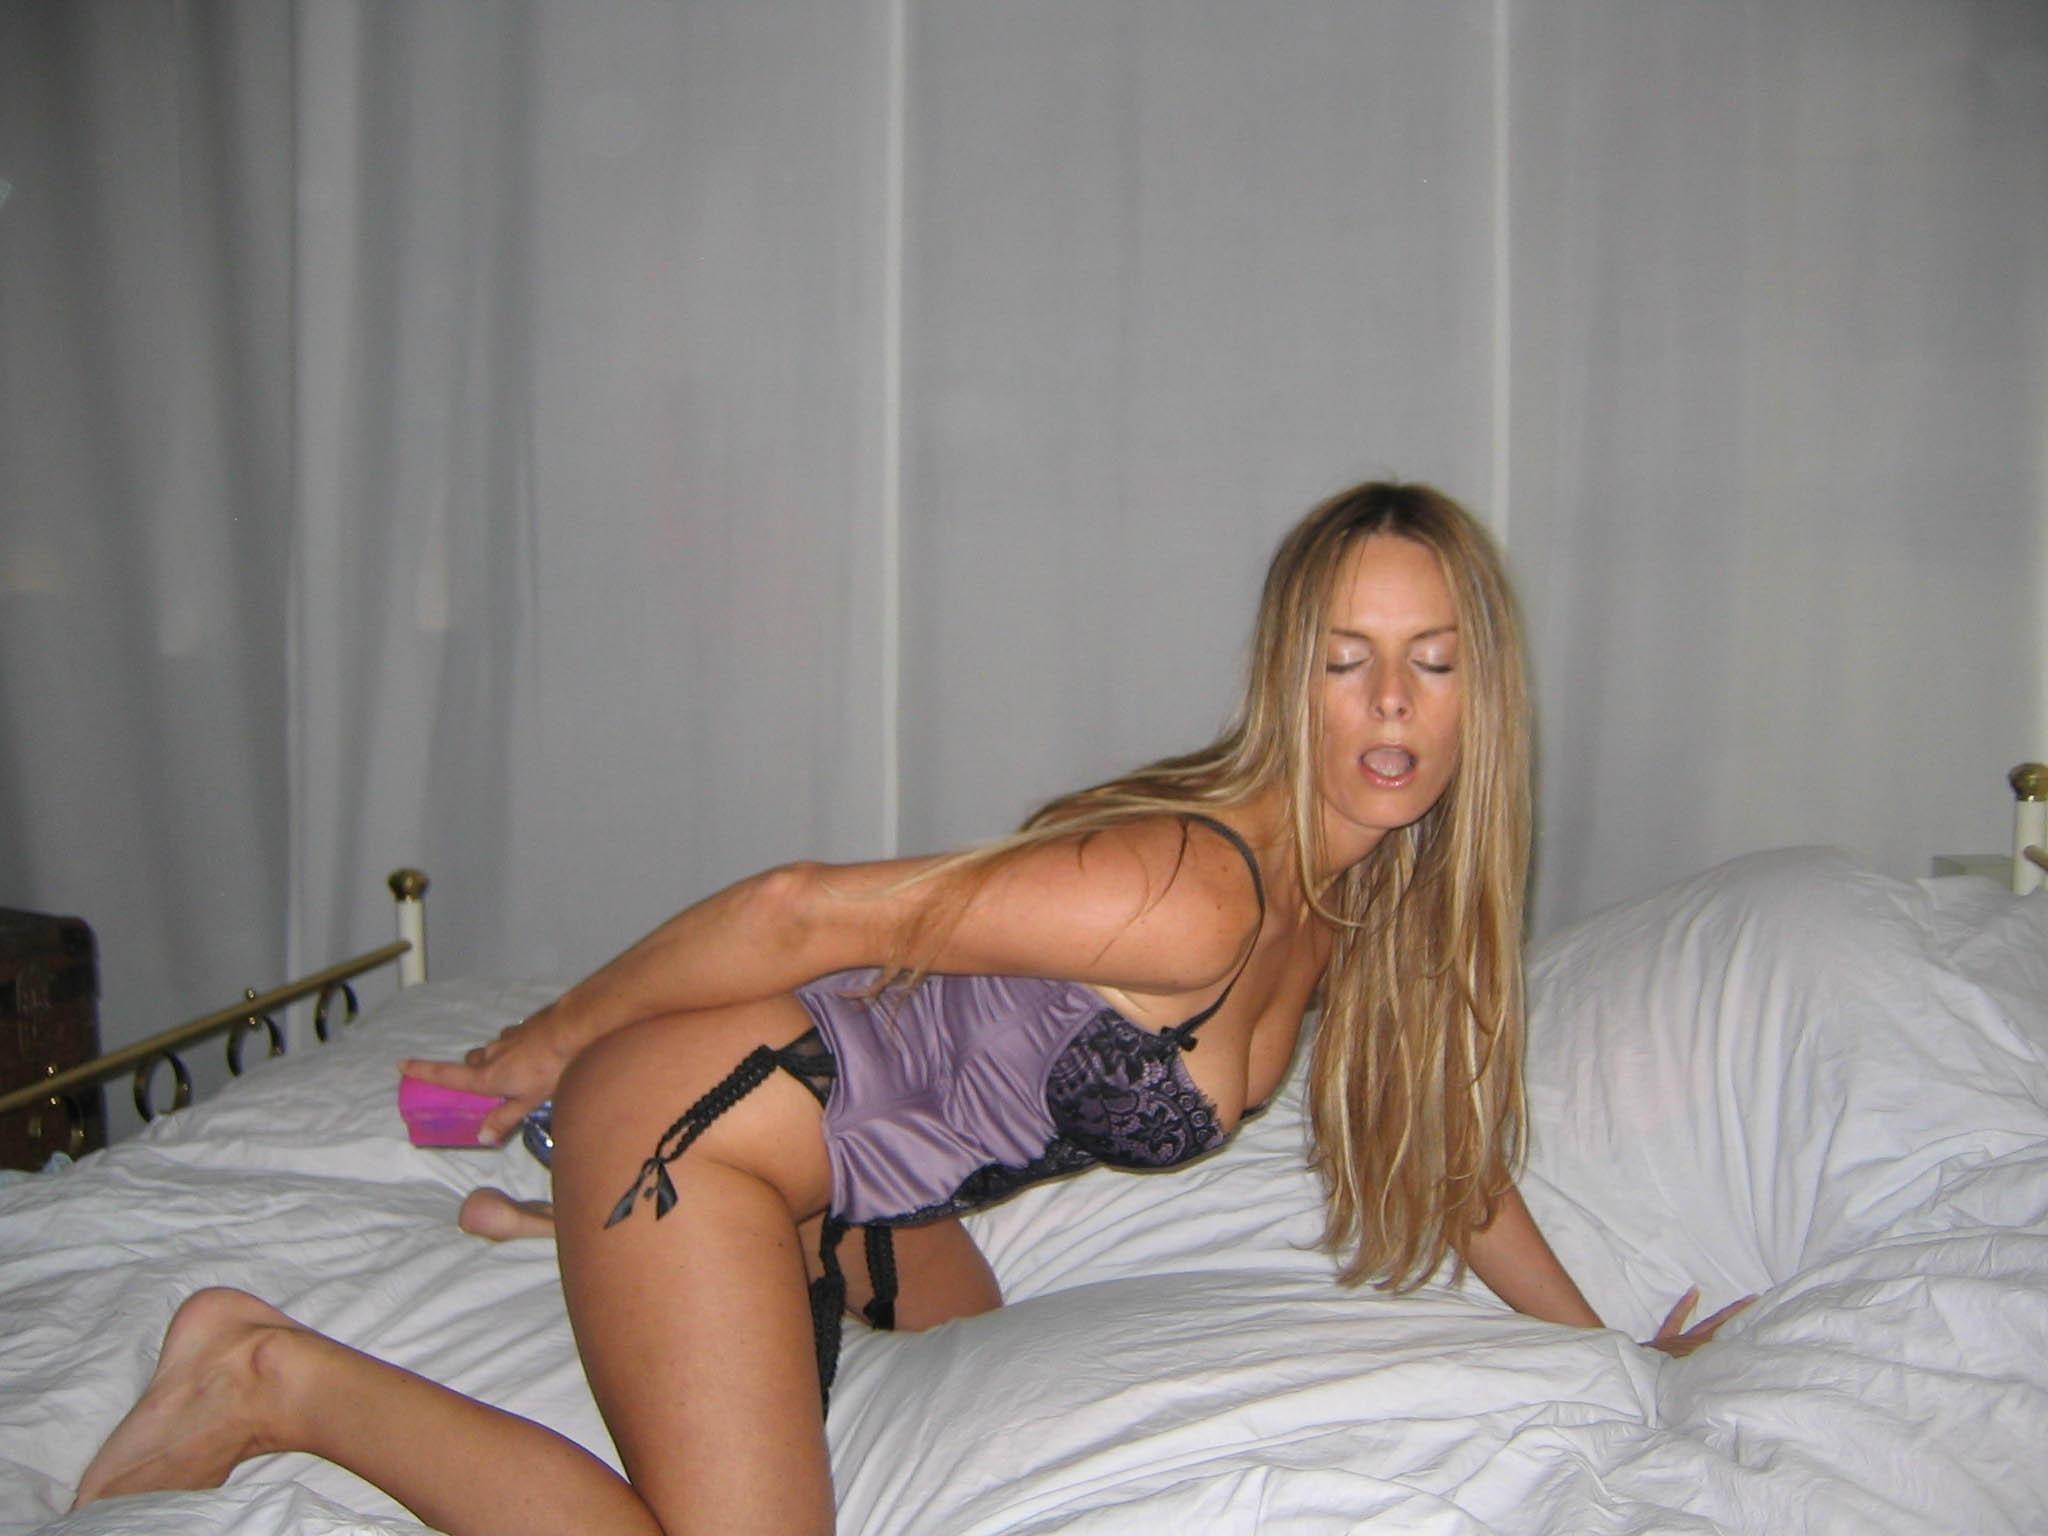 http://pbs-2.adult-empire.com/85/8570/004/pic/6.jpg